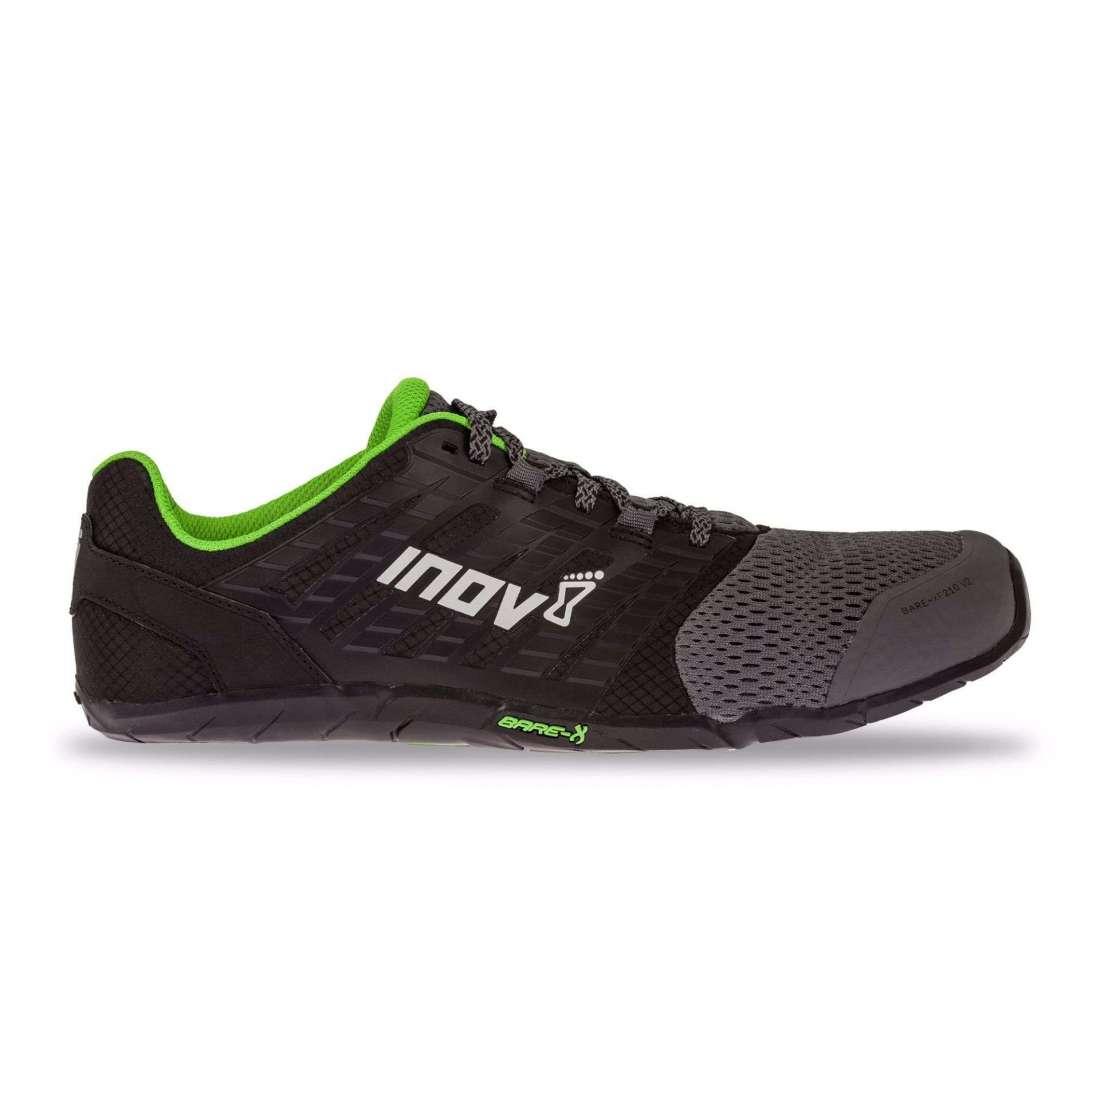 Inov  Bare Xf  Running Shoes